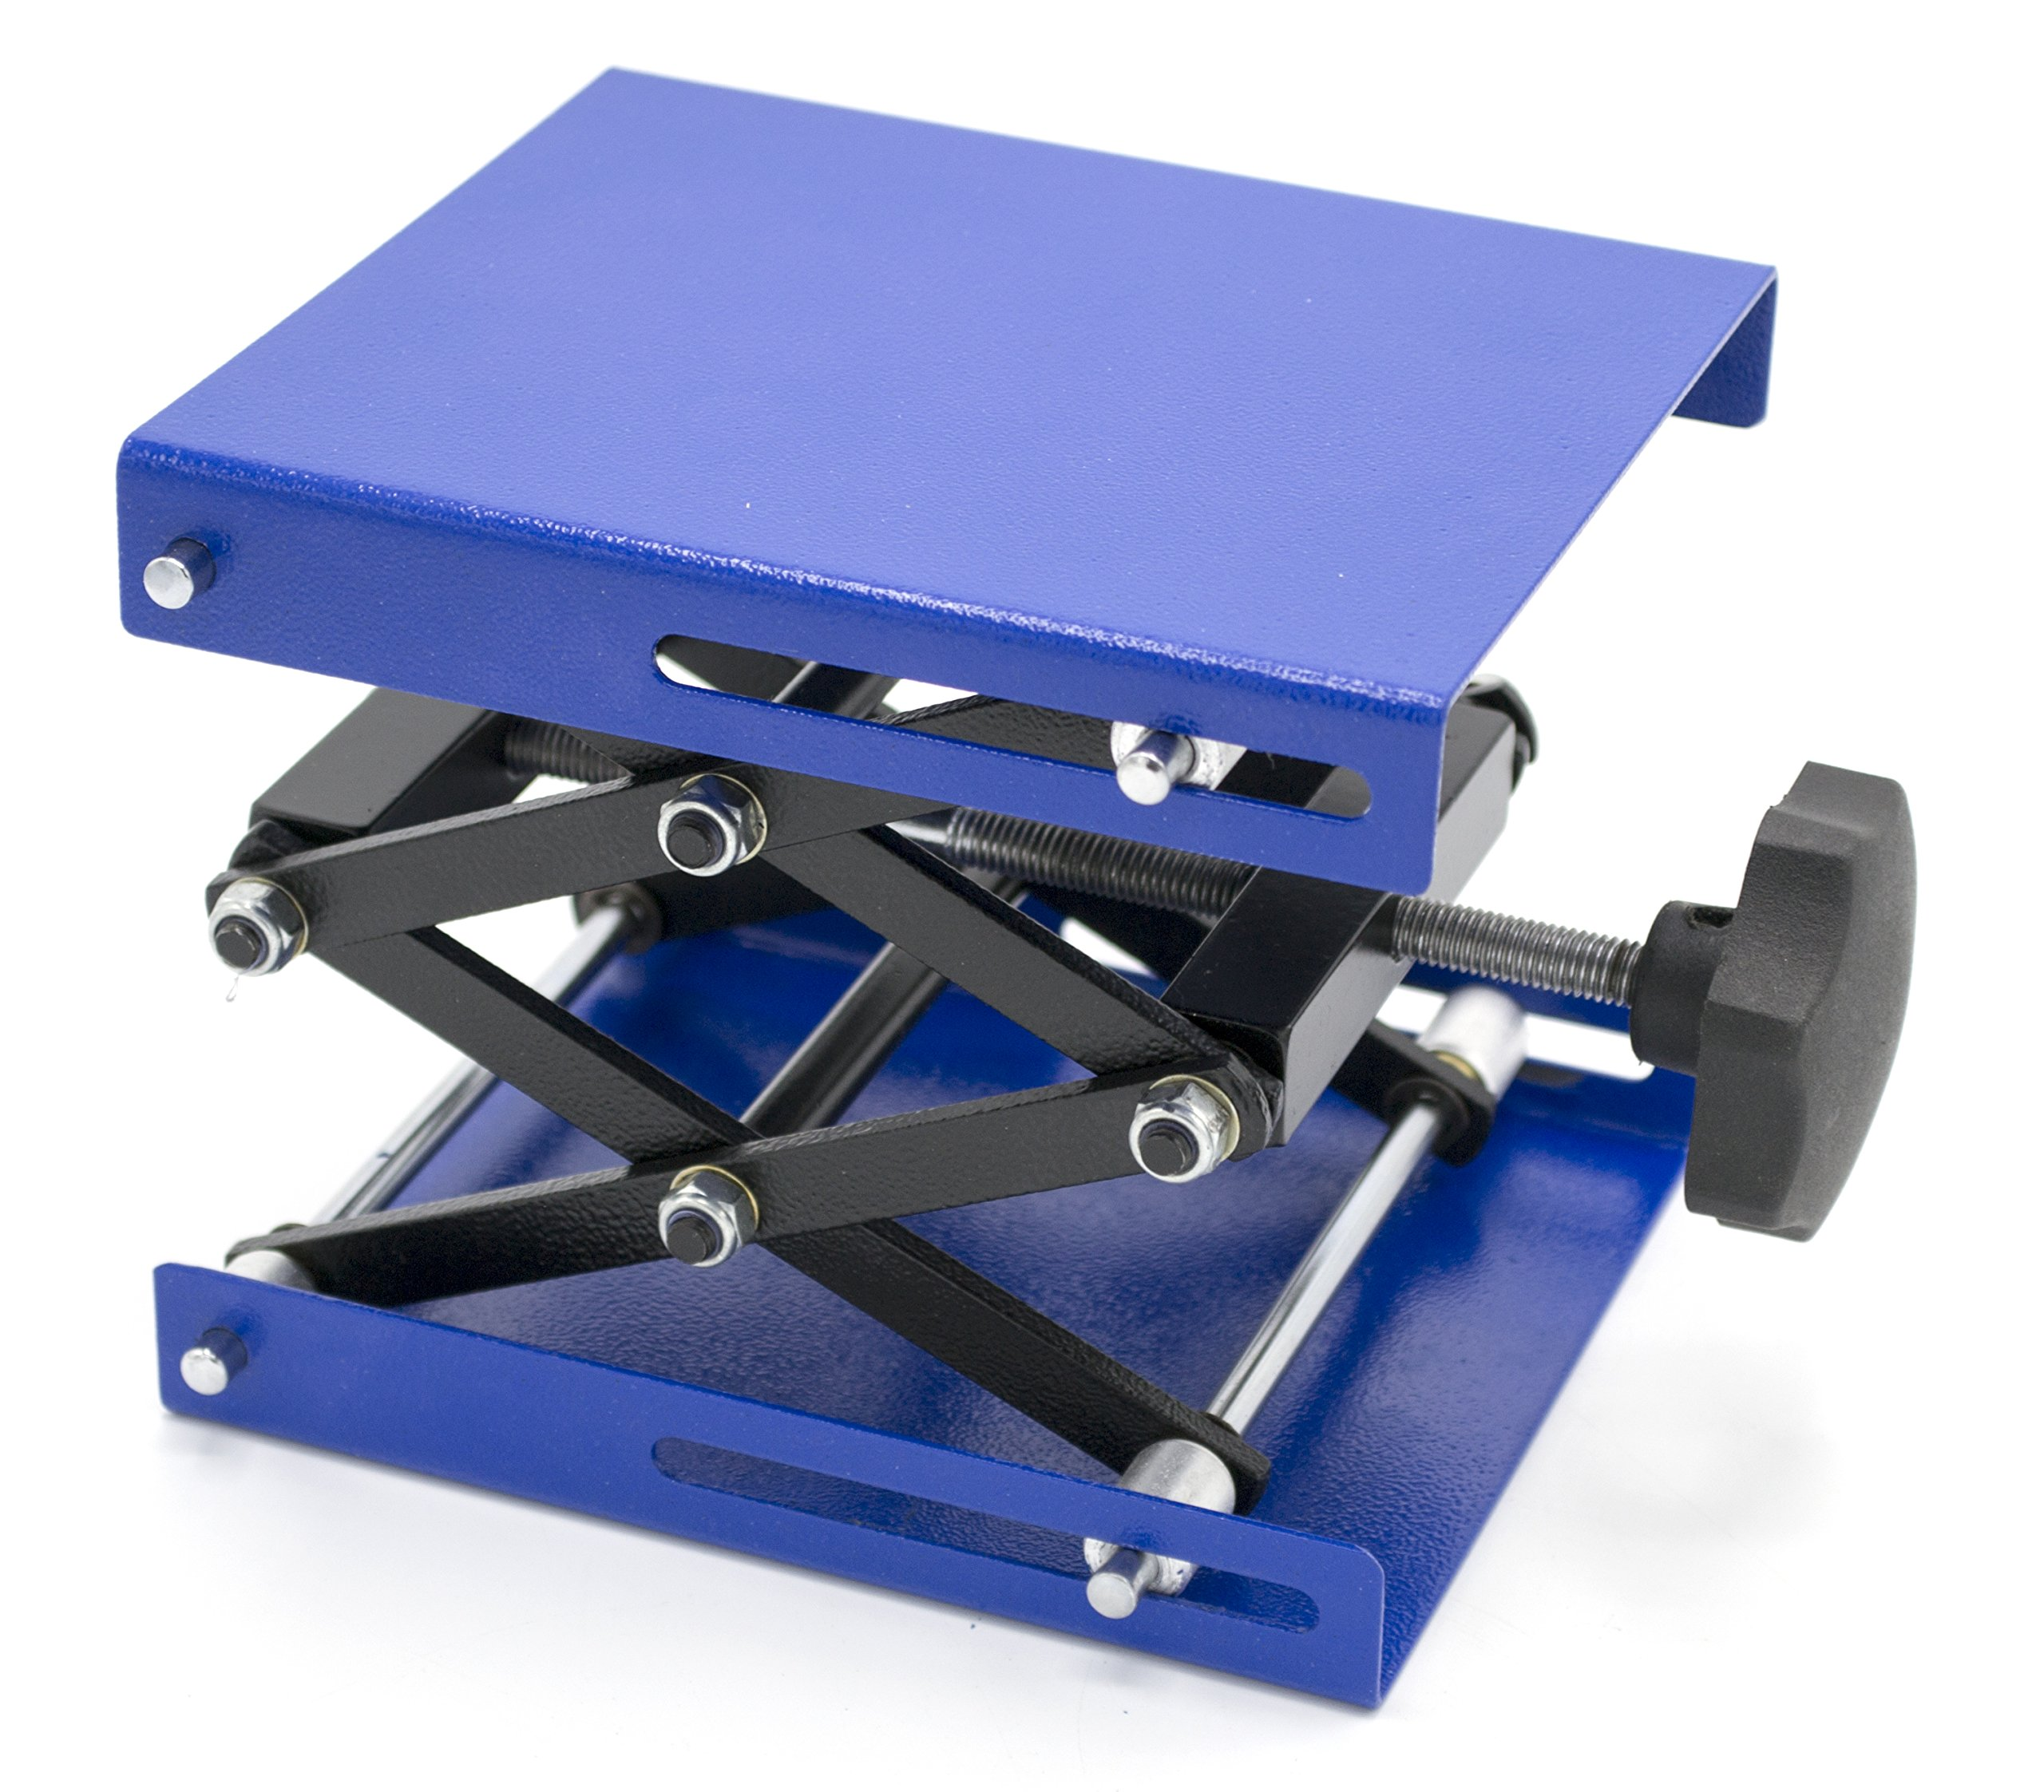 Heavy Duty Laboratory Scissor Jack - Steel Platform 6'' by 5''- Max Height 9 5/8'', Min Height 2 1/2'' - Maximum Stable Weight 55lbs